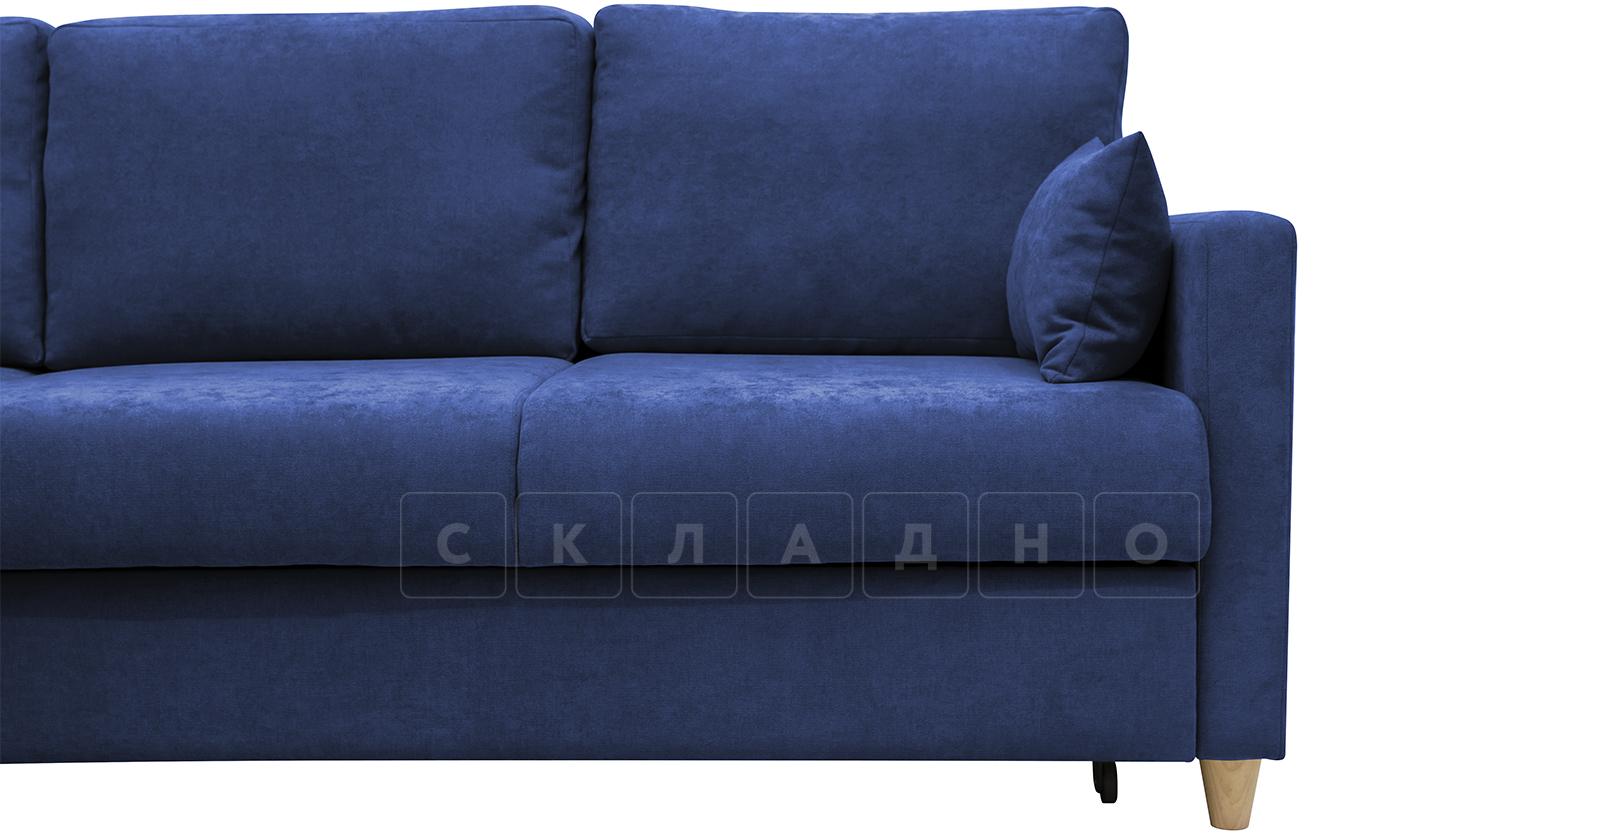 Угловой диван Дарвин темно-синий фото 12 | интернет-магазин Складно